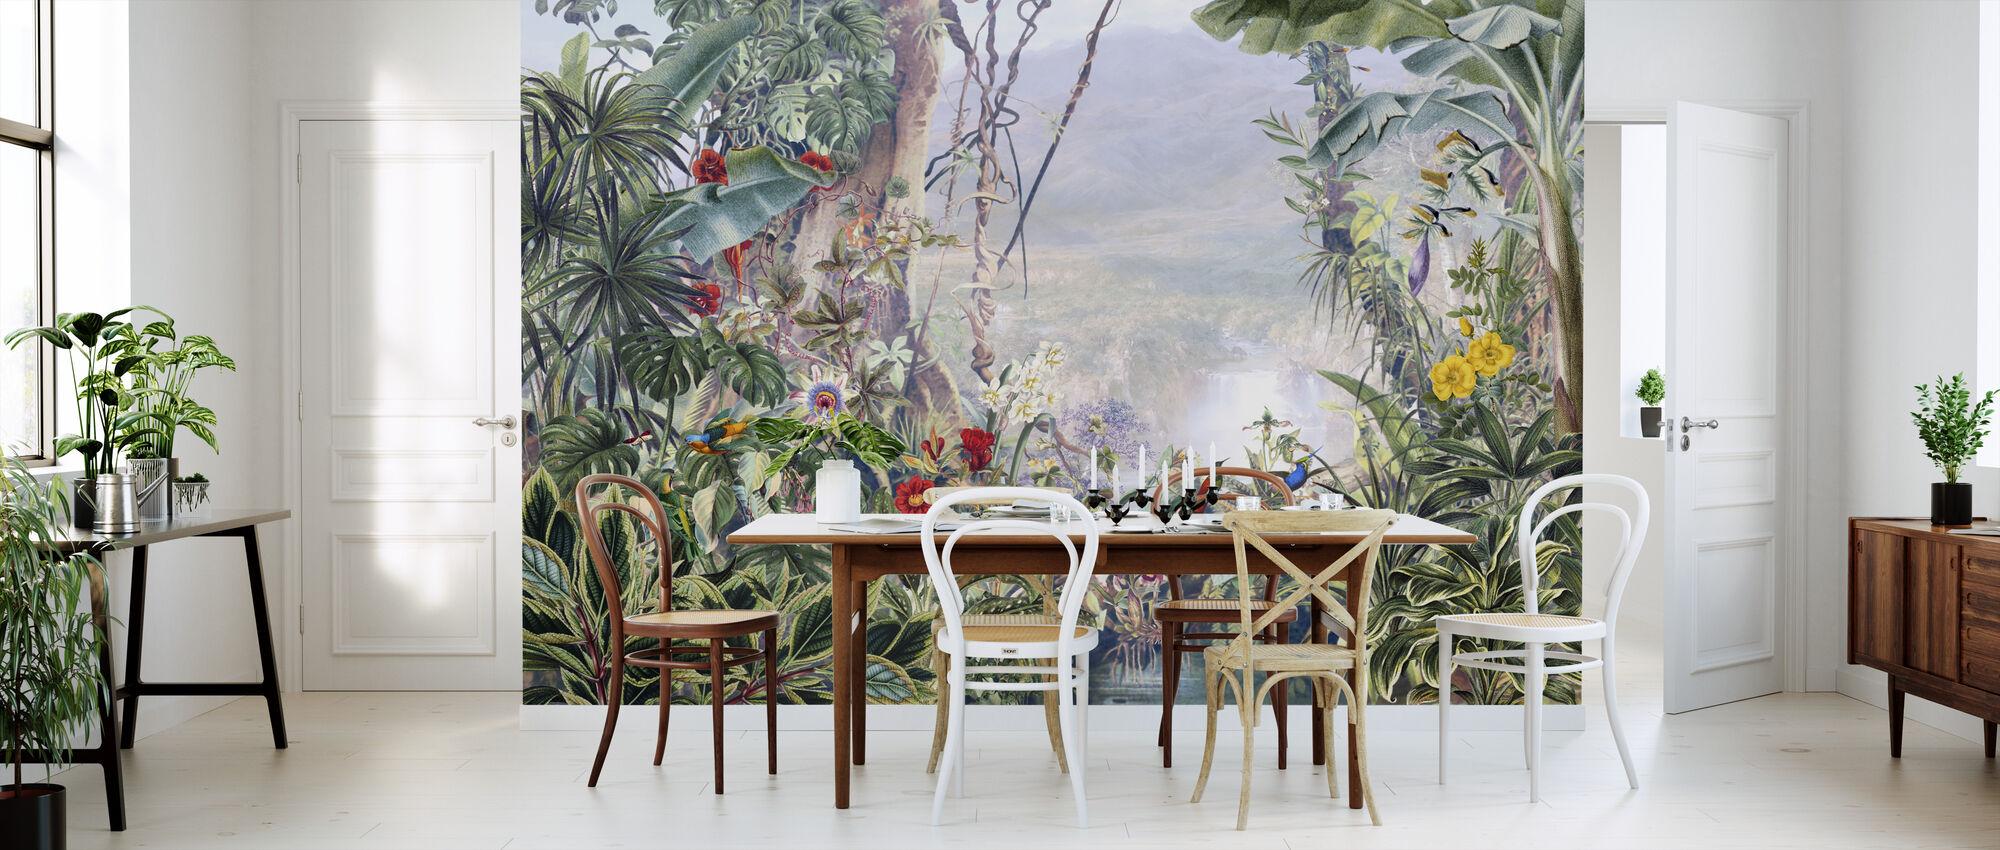 Misty Tropical Jungle - Wallpaper - Kitchen